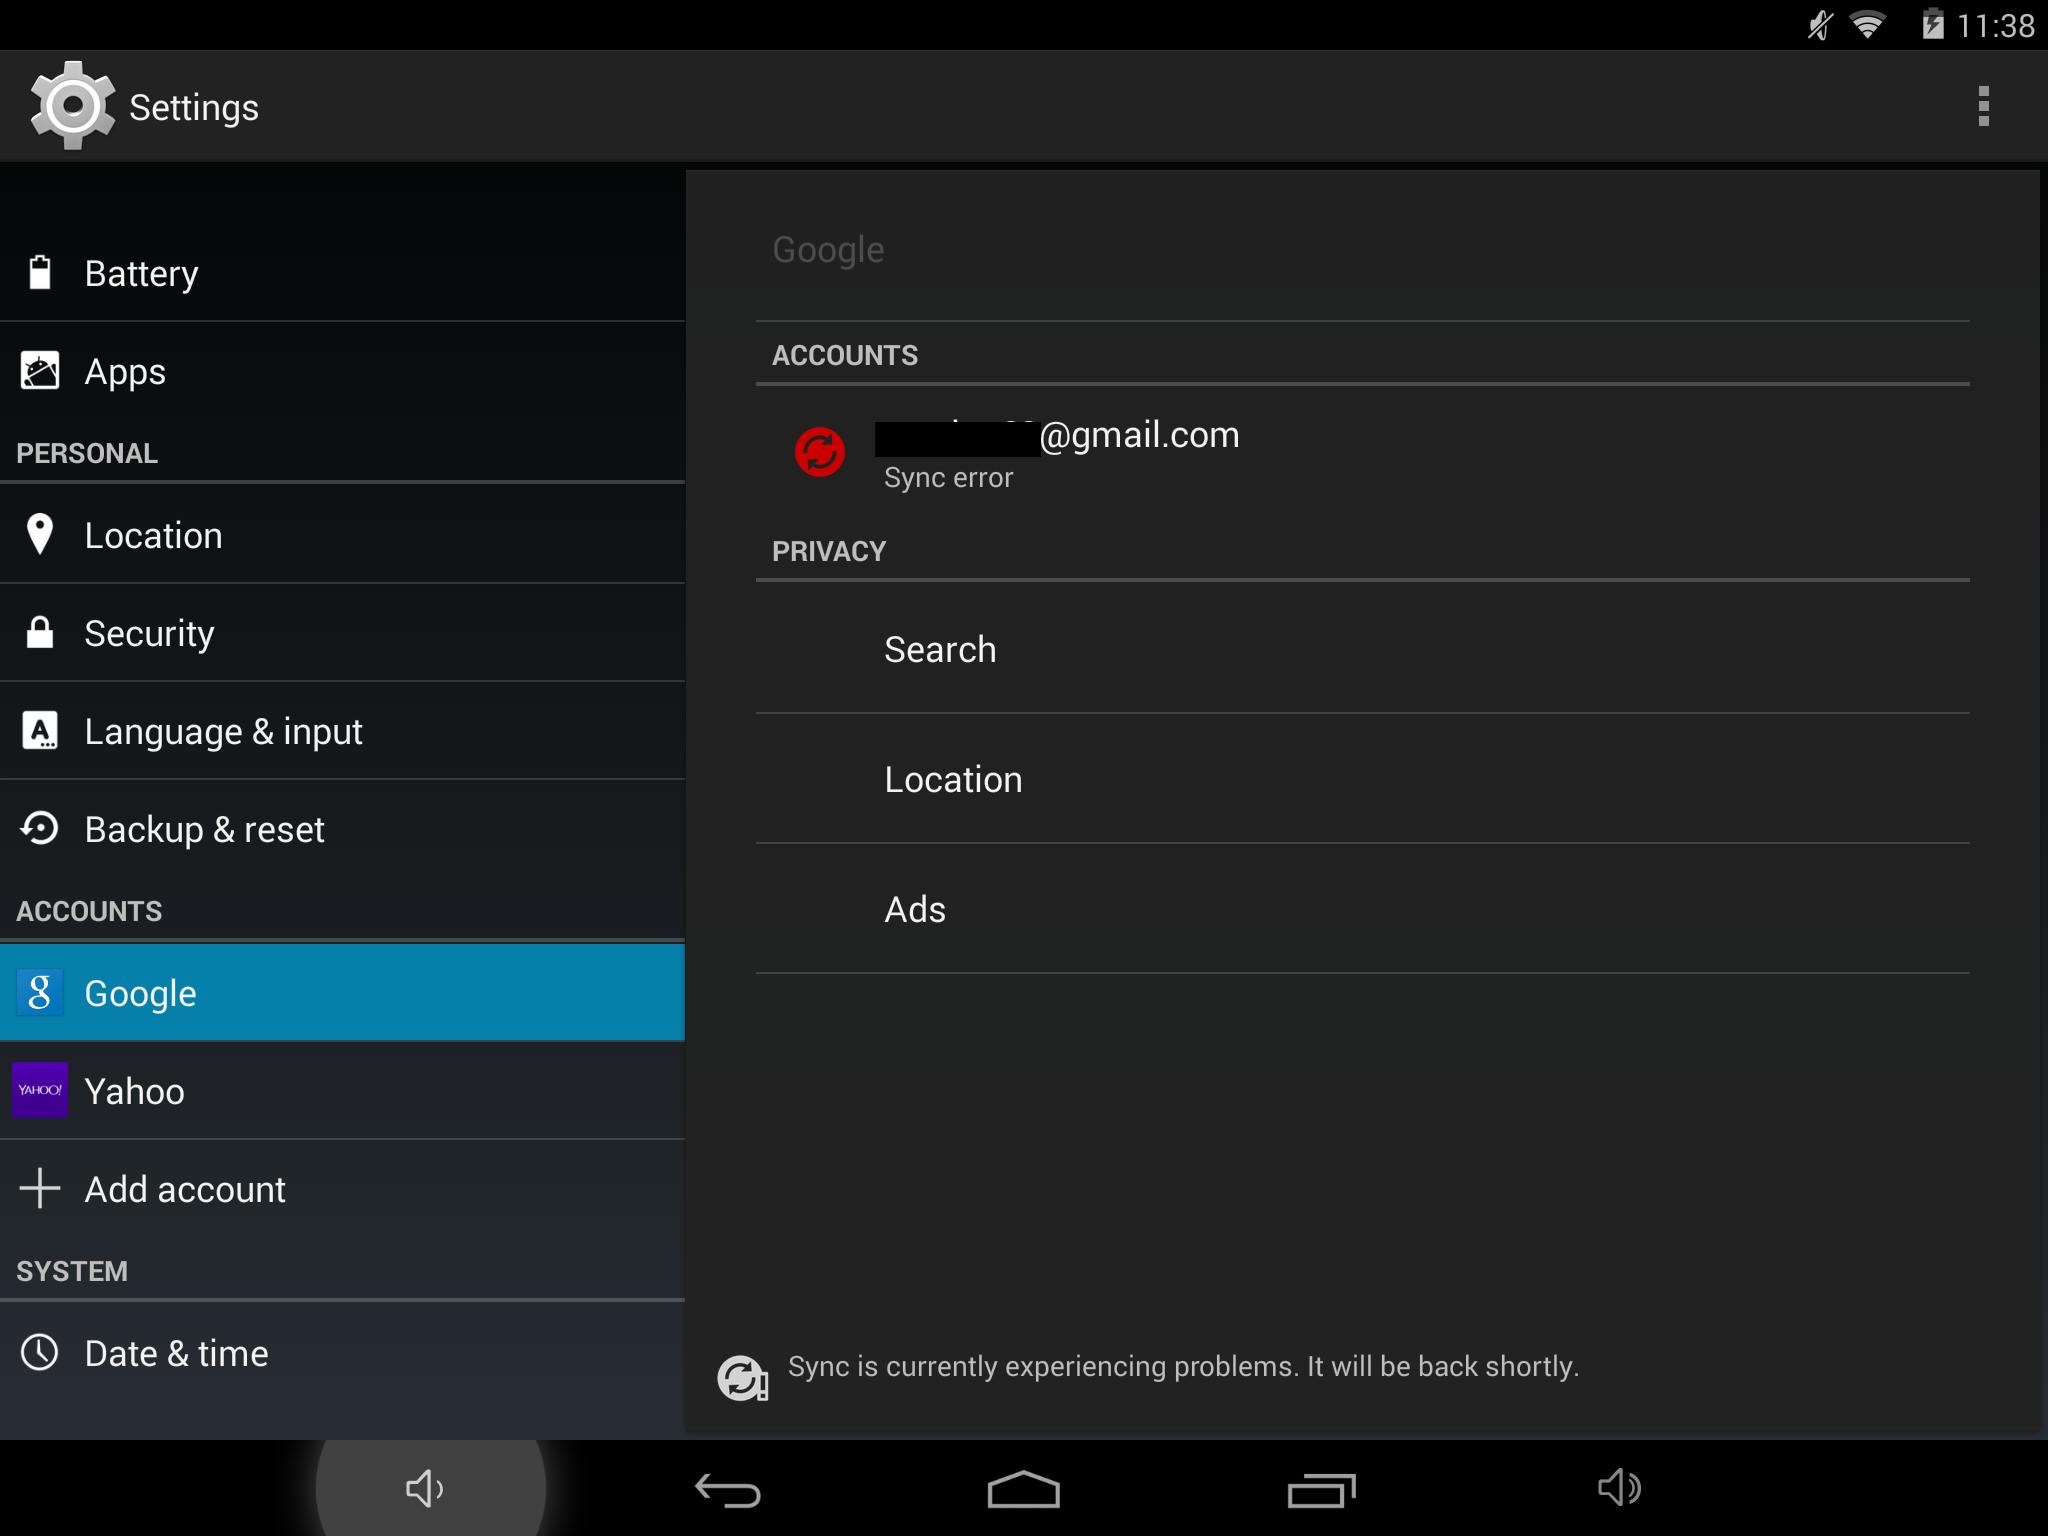 Screenshot_2014-05-18-11-38-29-1.png